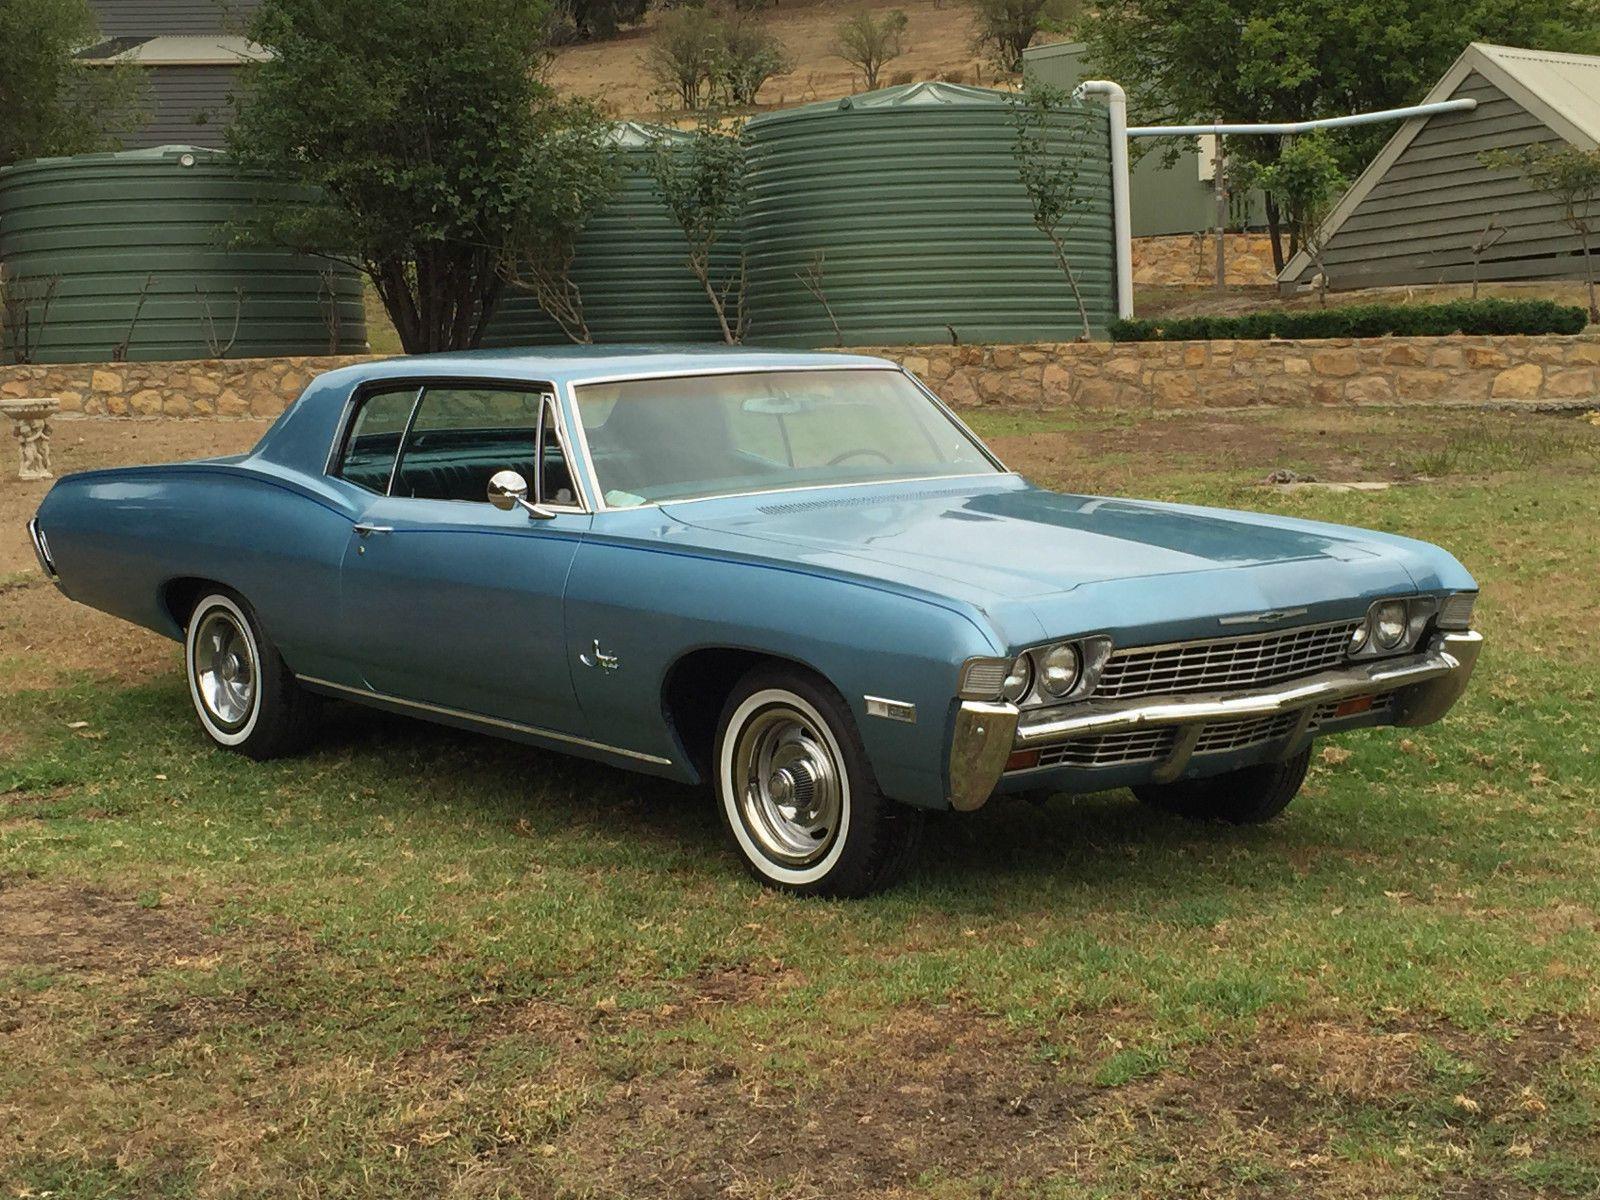 Chevrolet impala custom 1968 327 V8 auto MAKE OFFER, CONSIDER SWAP ...